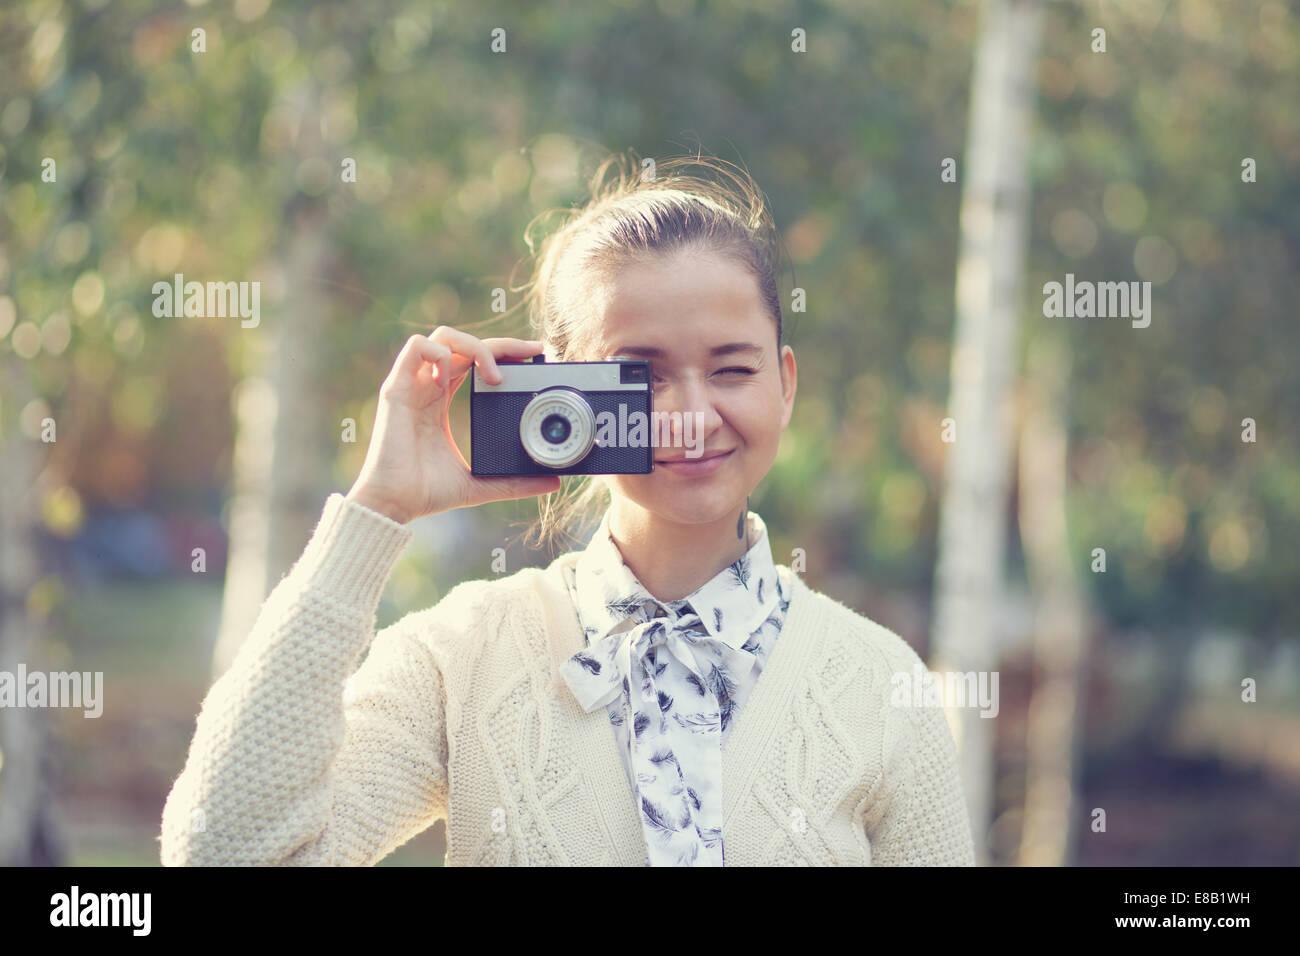 Hipster girl tournage sur film en plein air de l'appareil photo Photo Stock